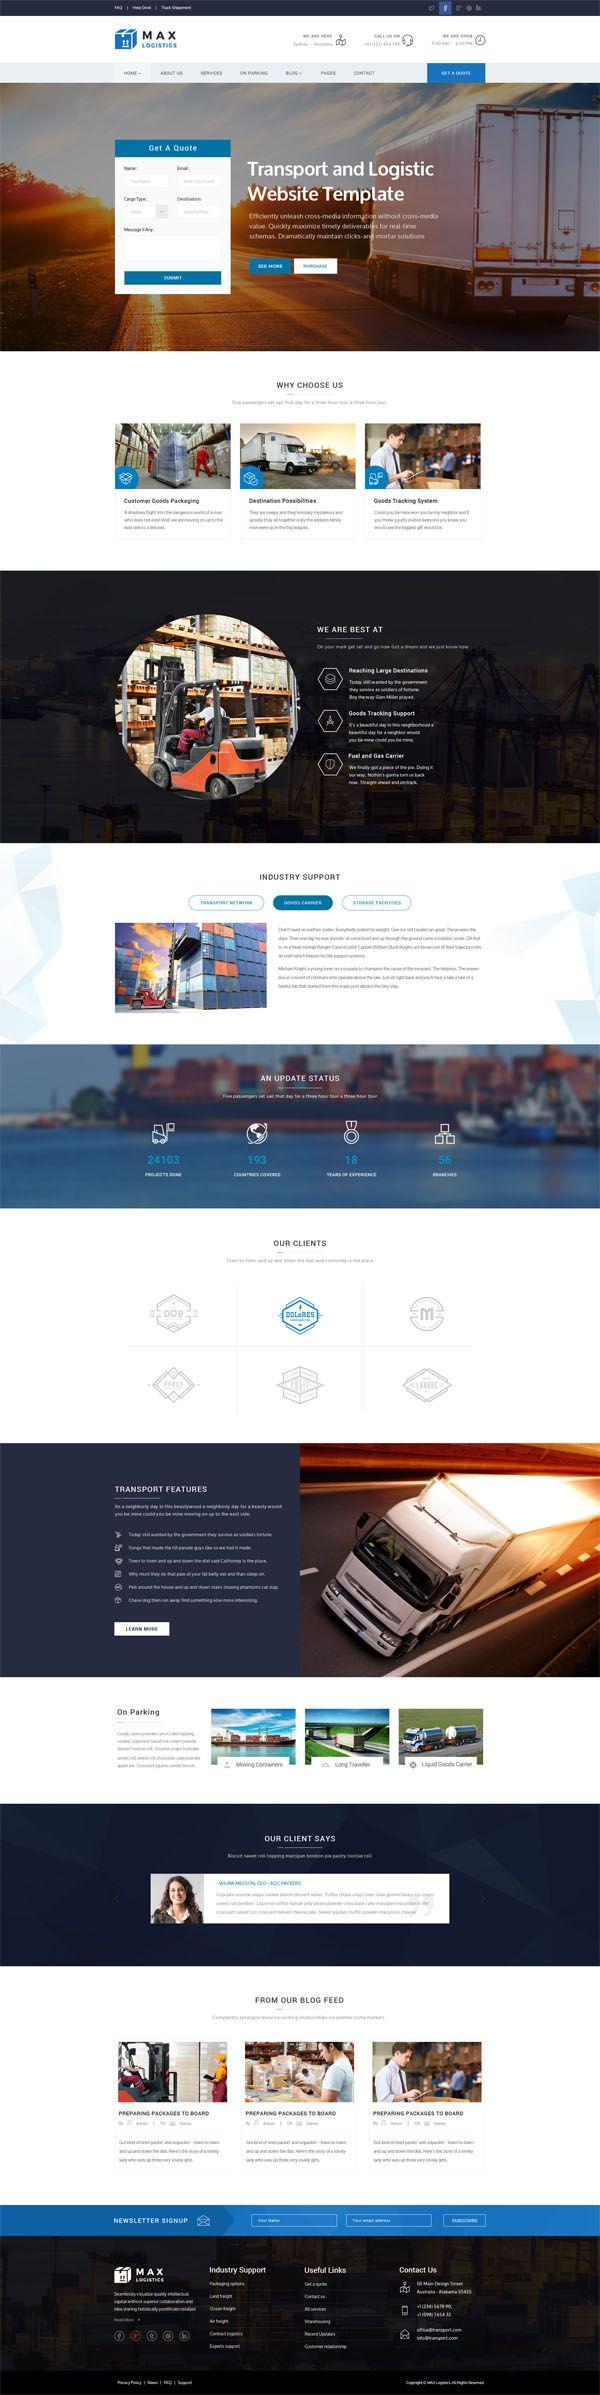 Air Cargo PowerPoint Template | Transportation PowerPoint Templates ...